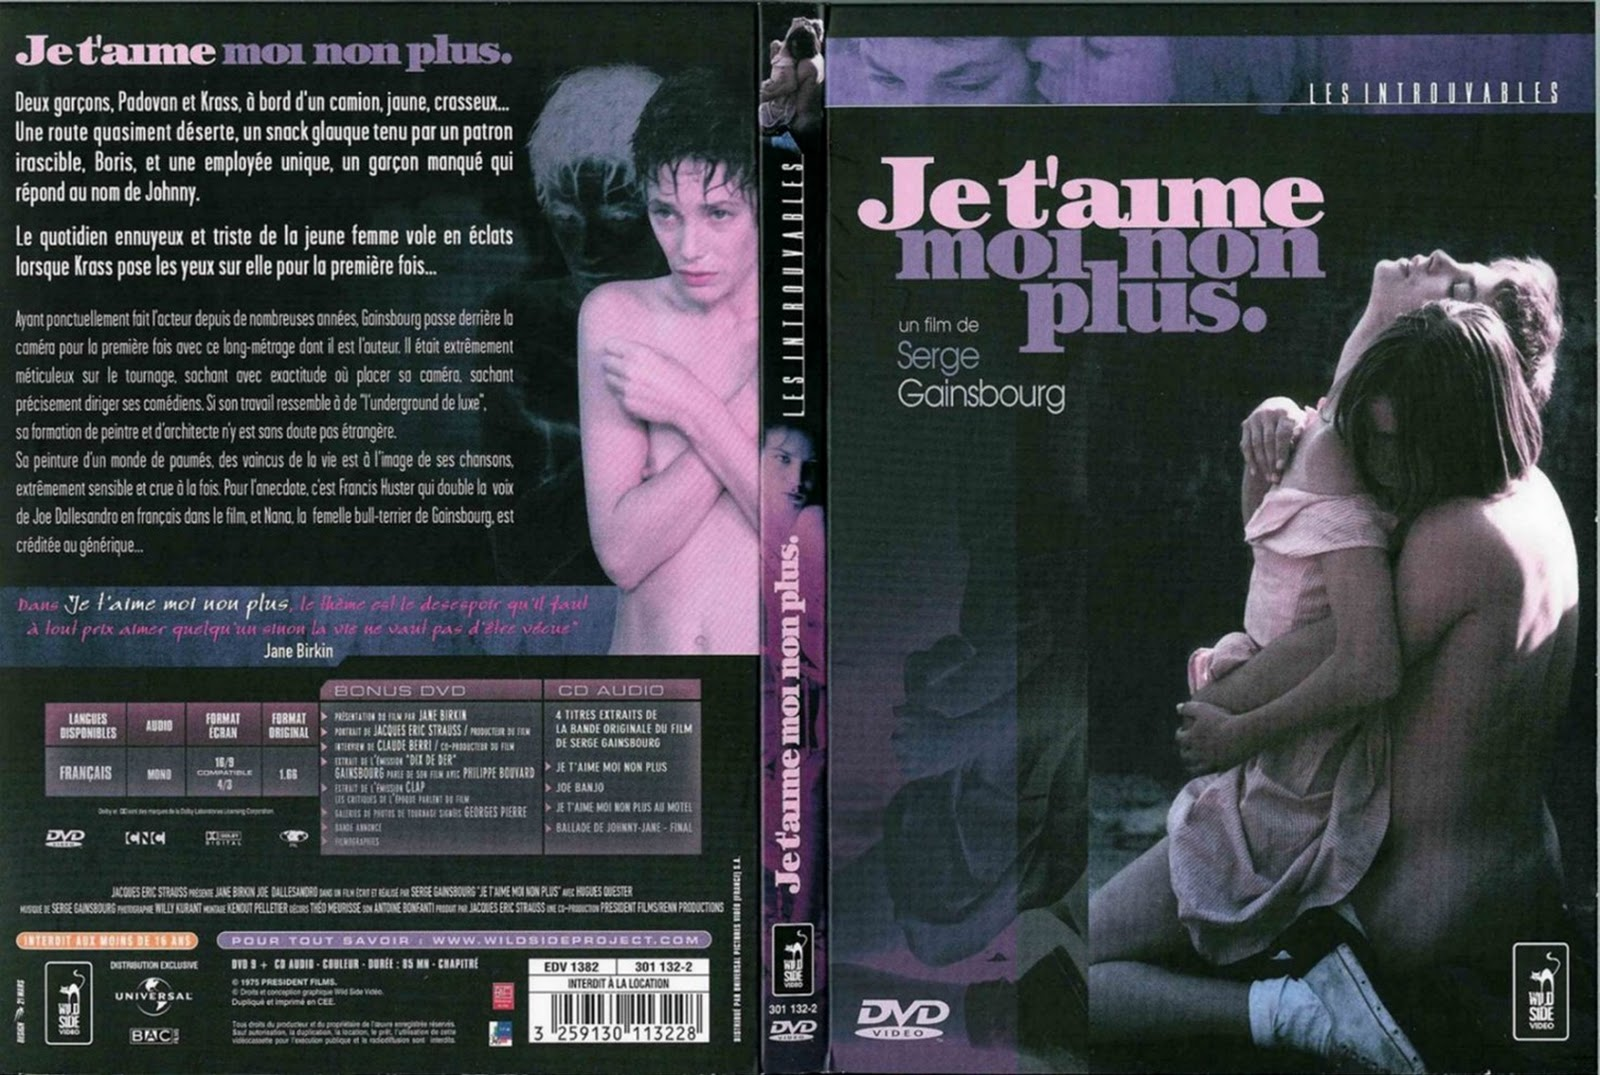 http://3.bp.blogspot.com/_tE7pxorPqL4/TScAGEty-cI/AAAAAAAAAcY/GI43_qrKVv0/s1600/Je+t%2527aime+moi+non+plus+1976+DVD+Cover.jpg